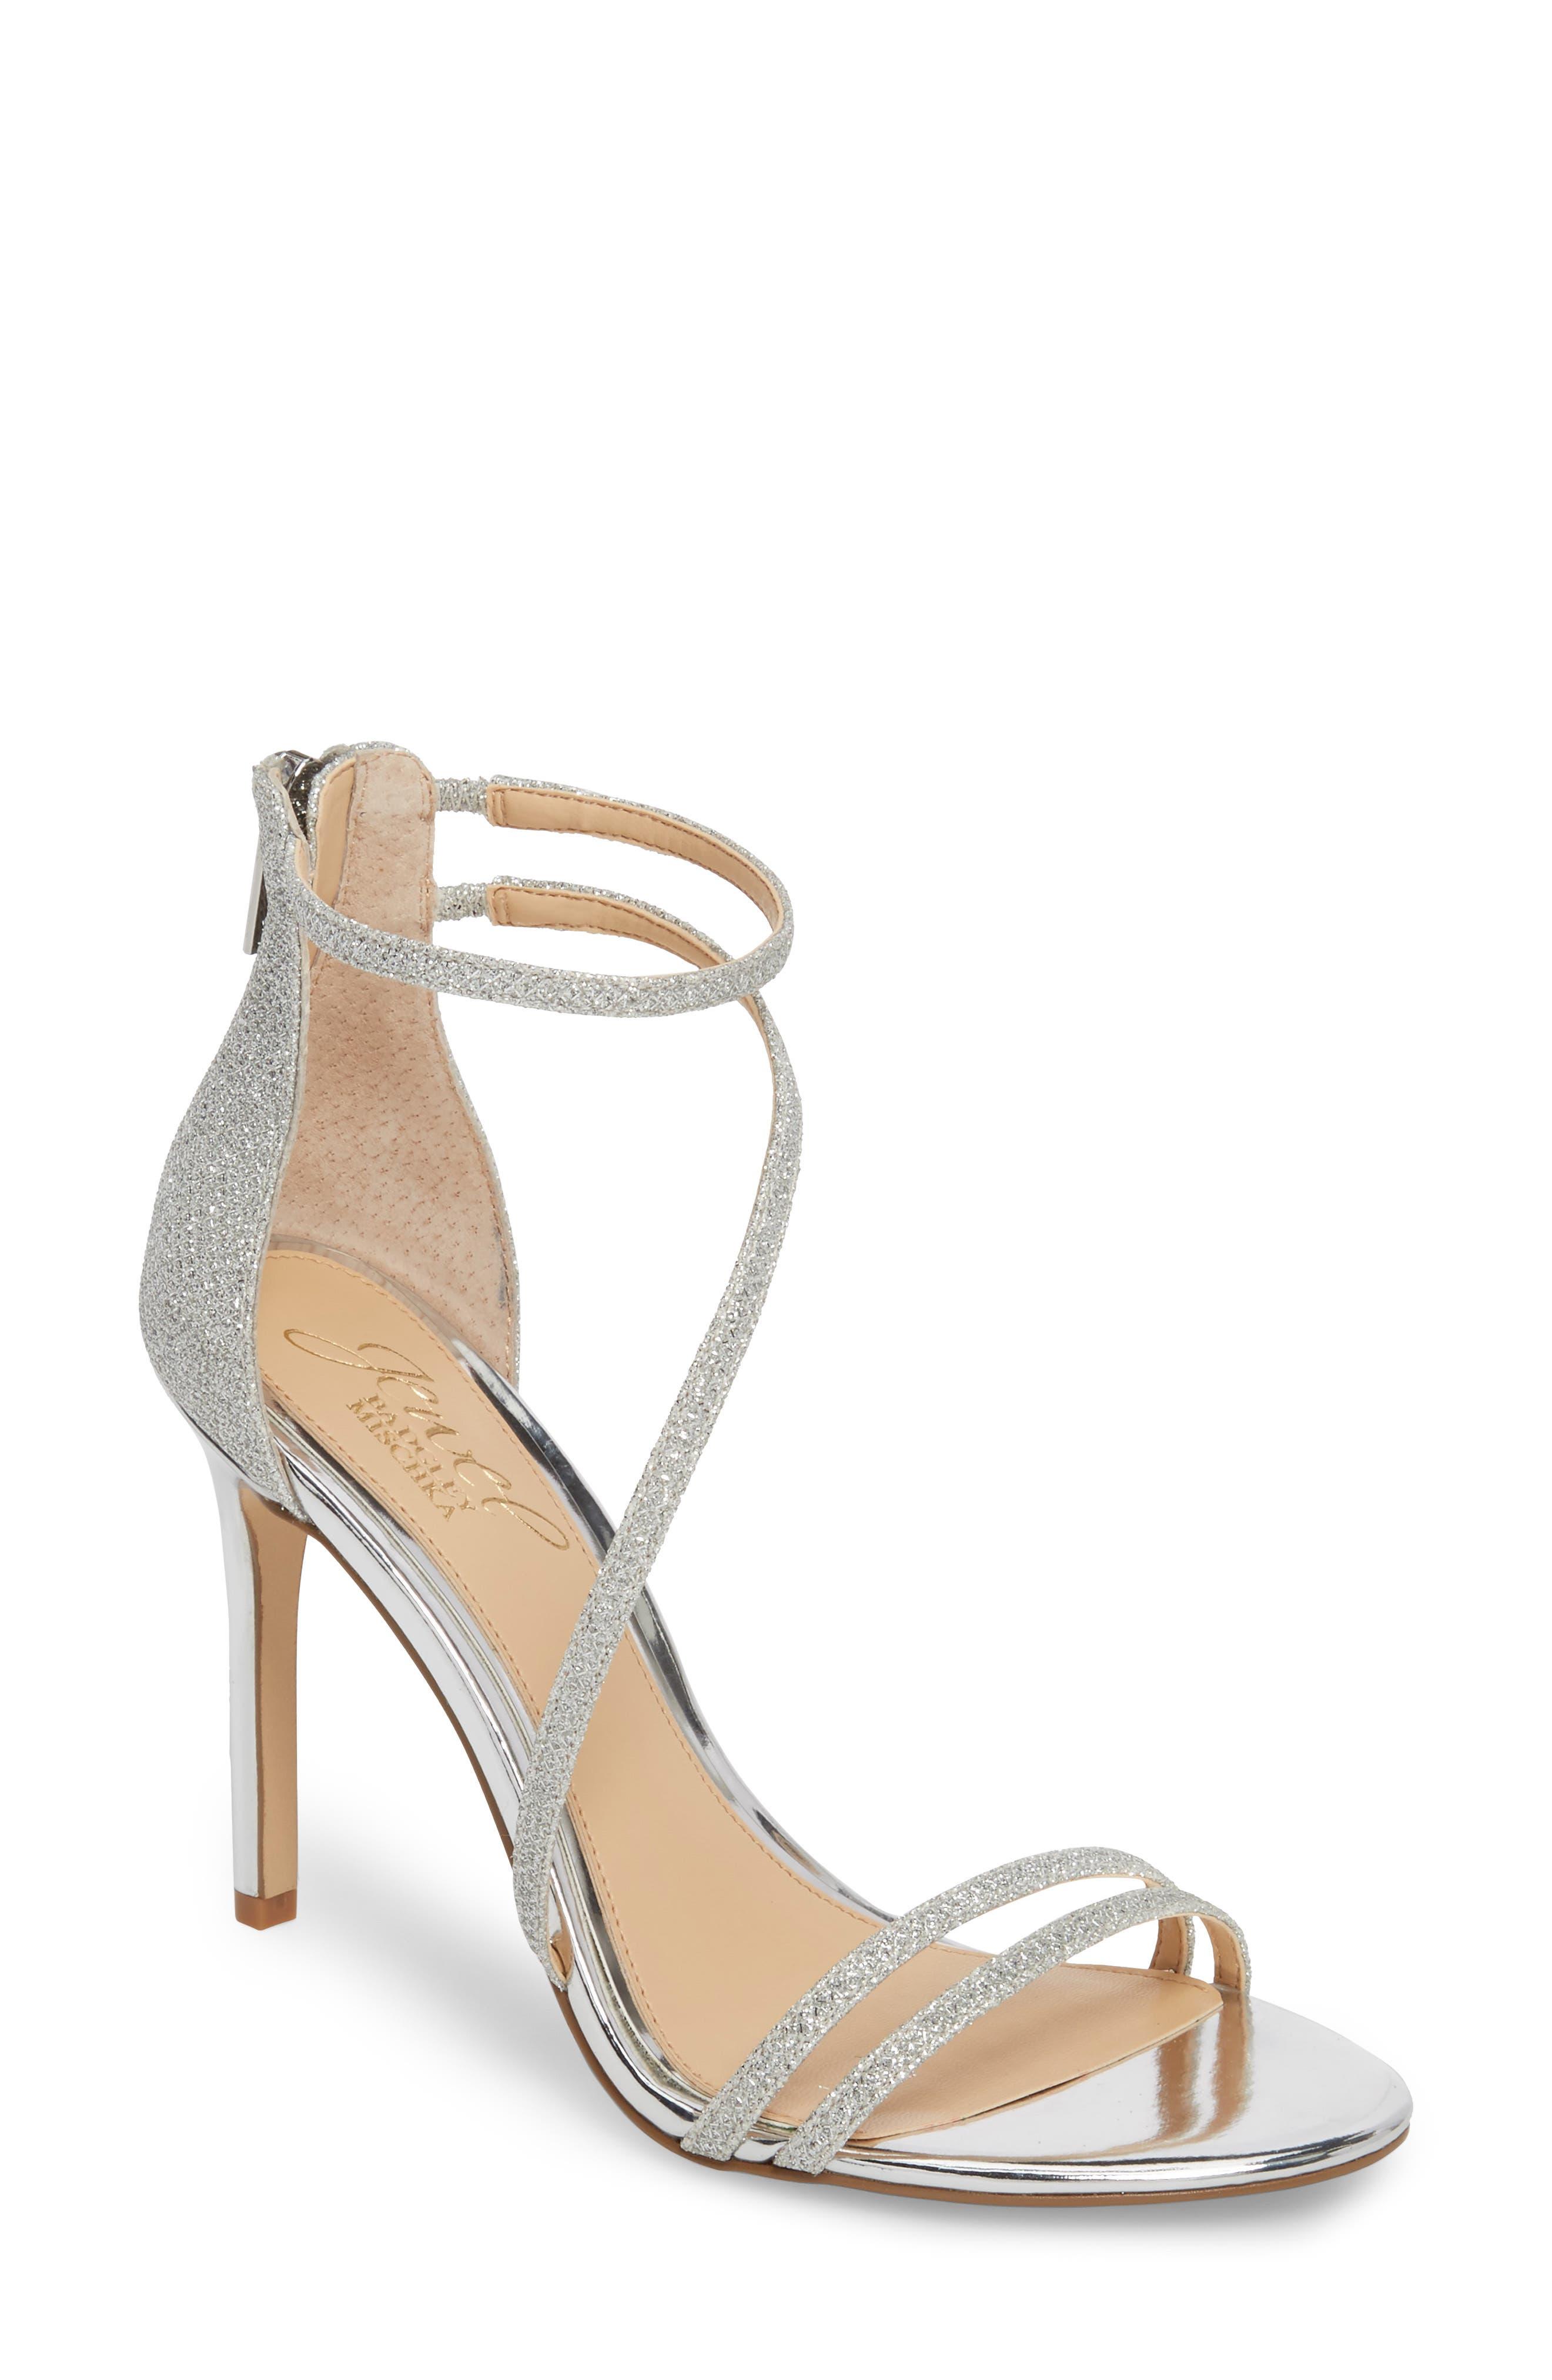 Jewel Badgley Mischka Gail Crystal Embellished Sandal (Women)